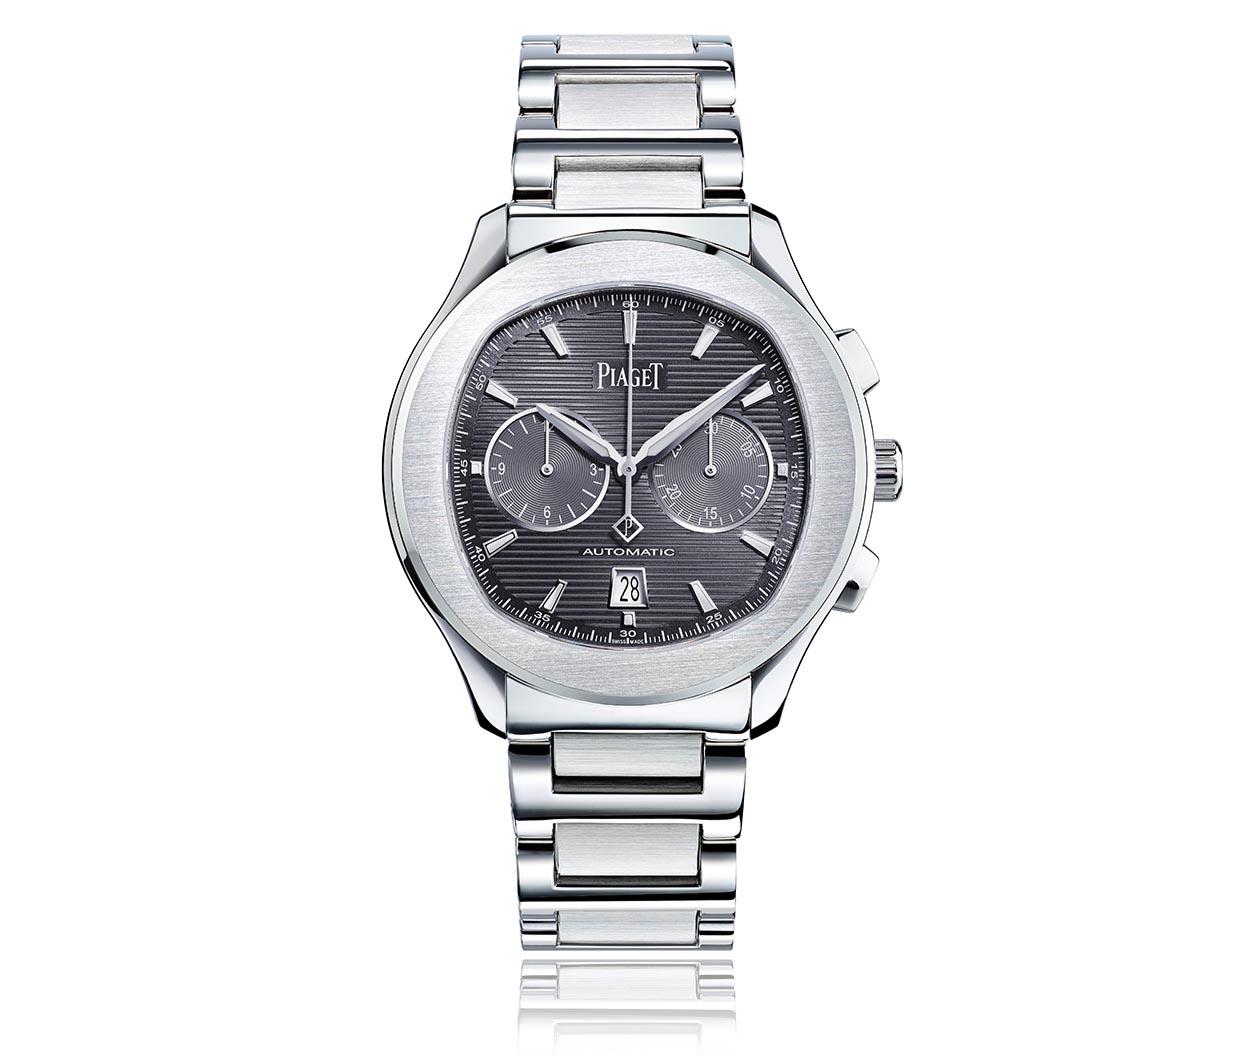 Piaget Polo watch G0A42005 Carousel 1 FINAL